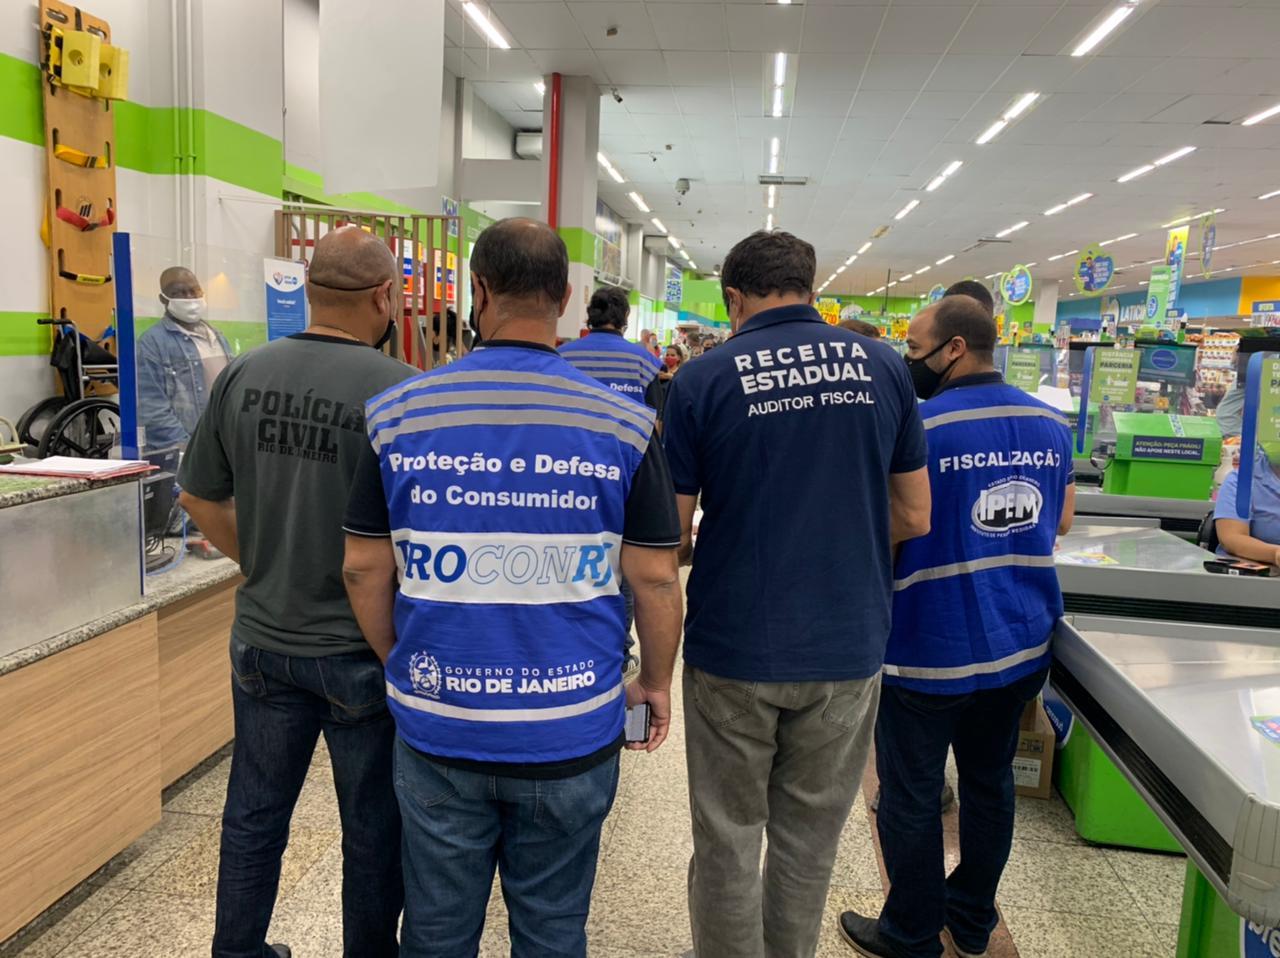 Procon-RJ_fiscaliza_supermercados_(2)_1628724381.8919.jpeg